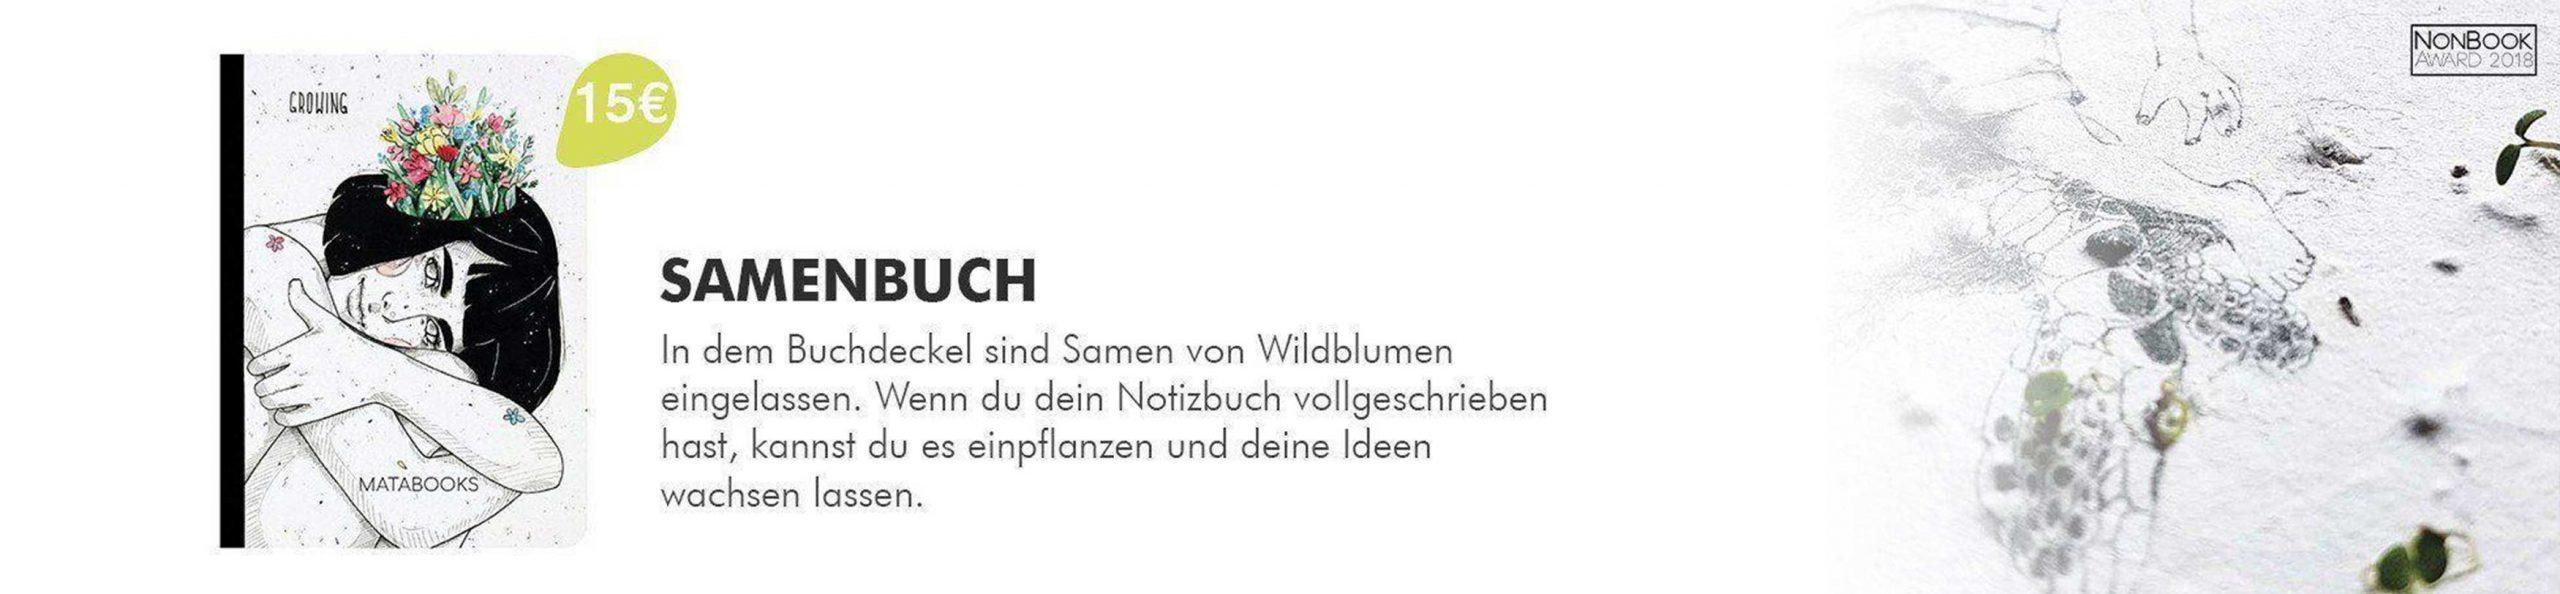 samenbuch-header